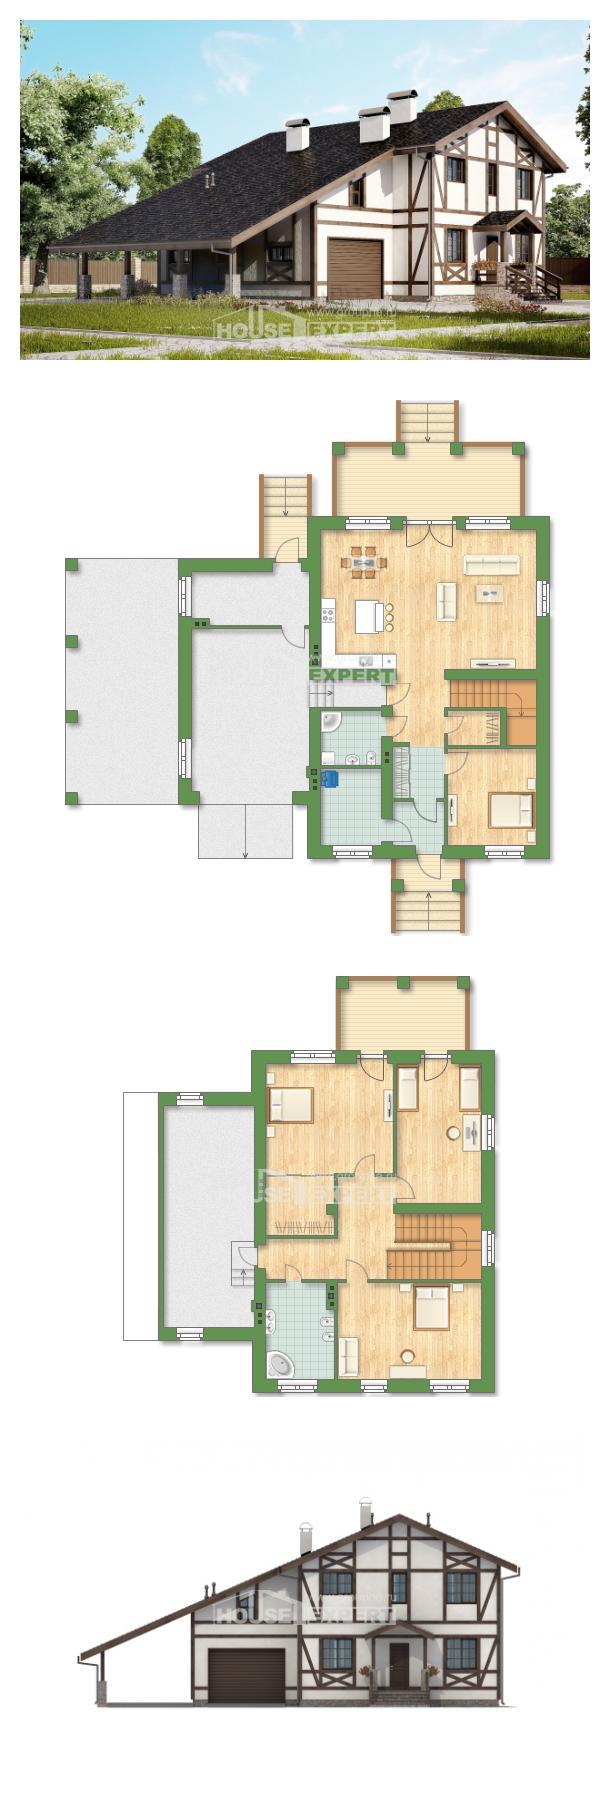 Proyecto de casa 250-002-L | House Expert